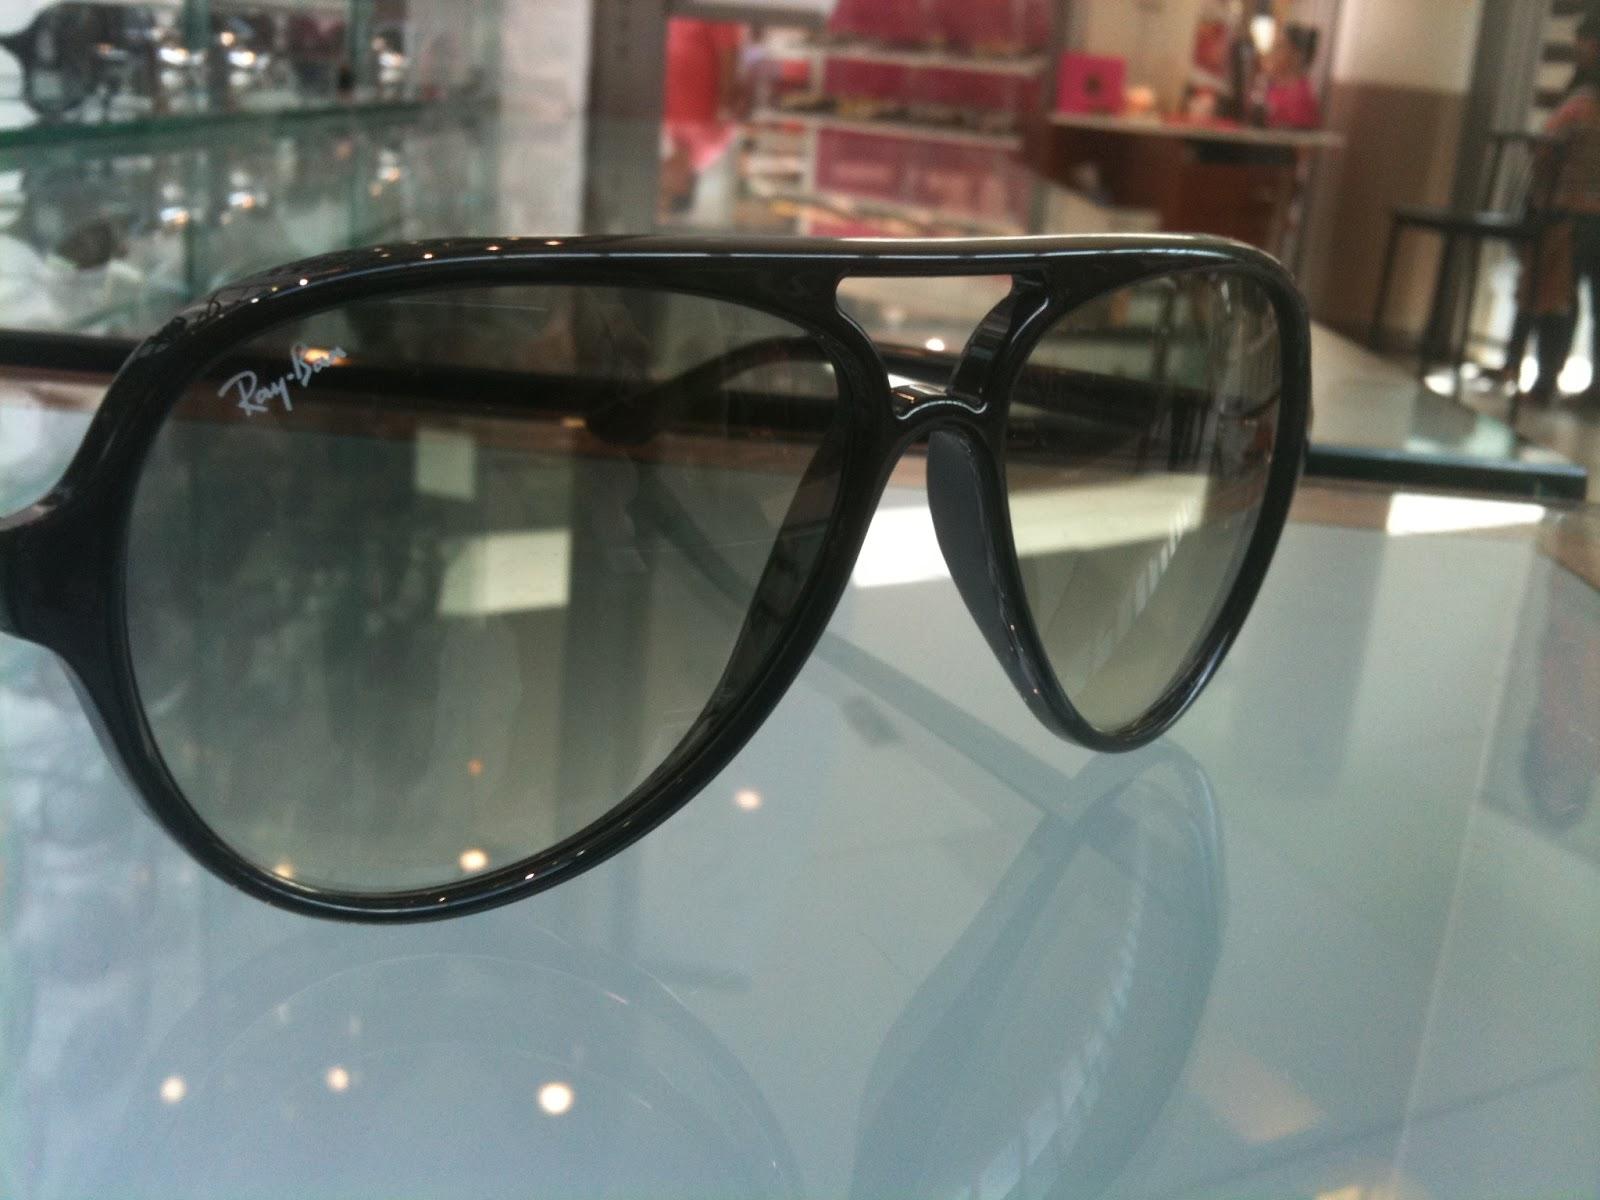 e1fca1efe4ea4 Oculos Ray Ban Comprar Em Miami